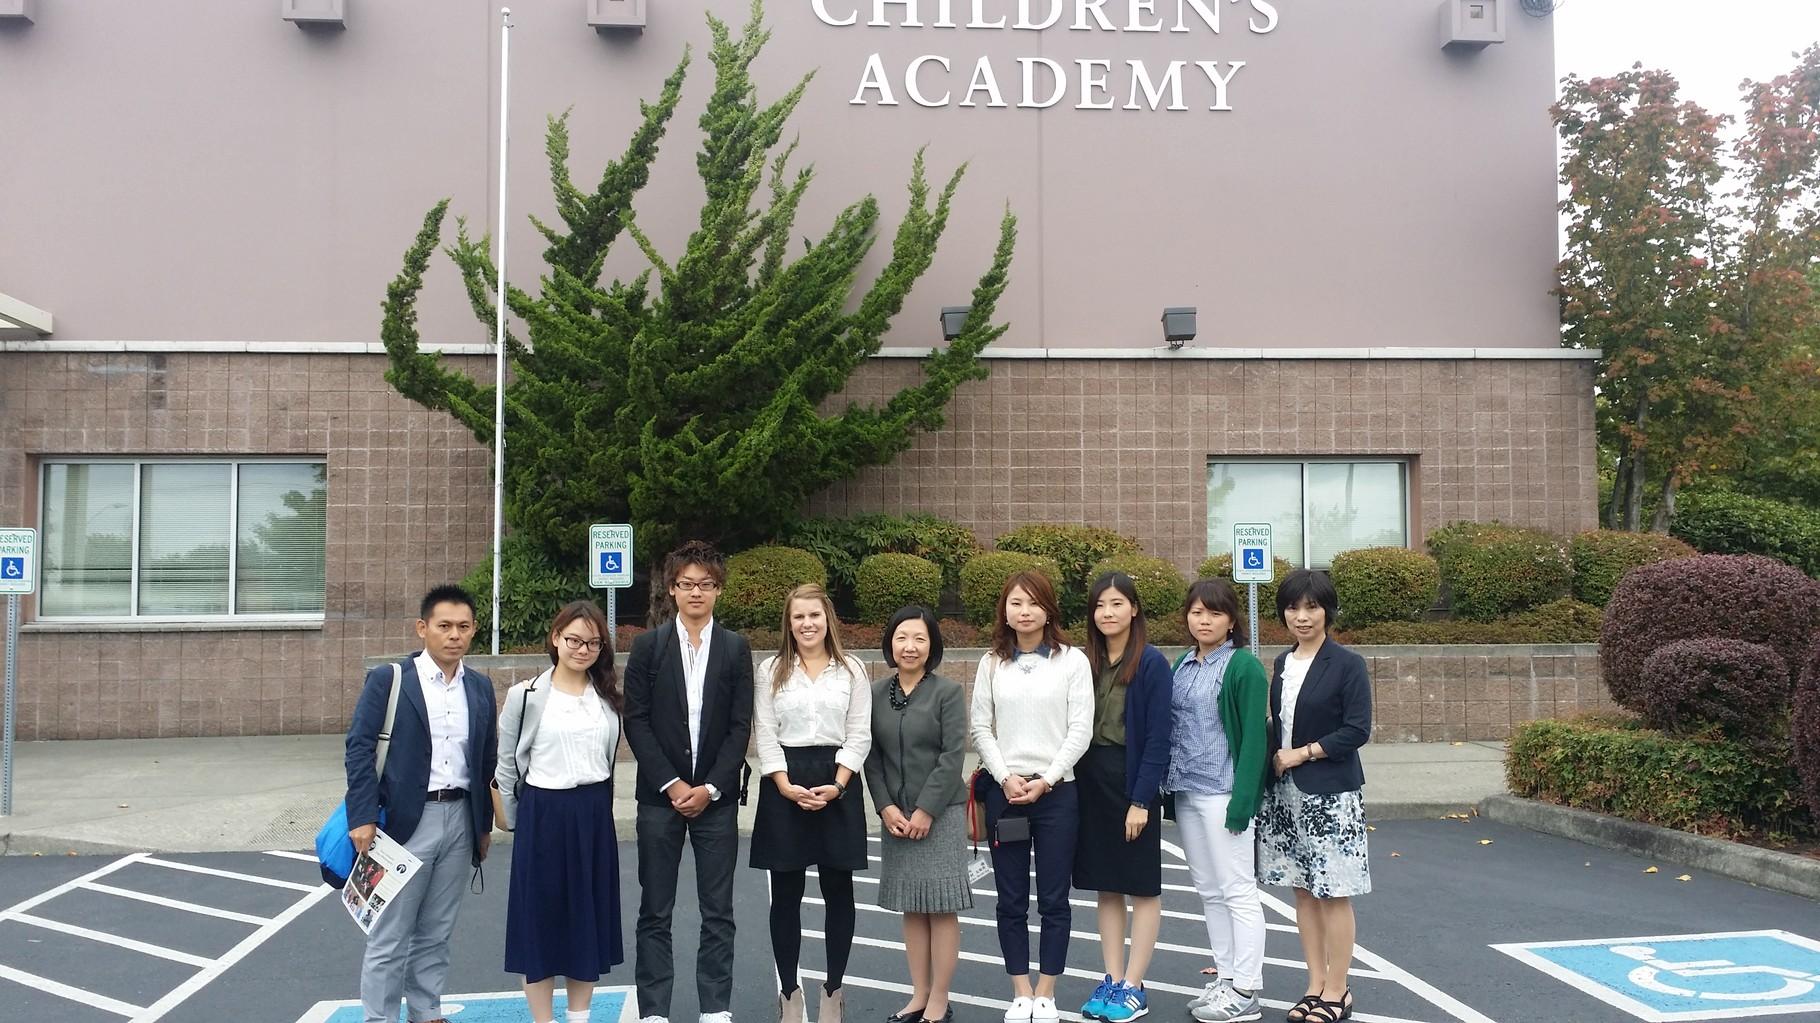 9月14日 Bellevue Childrens Academy訪問。清水理事長と。玉井会長提供